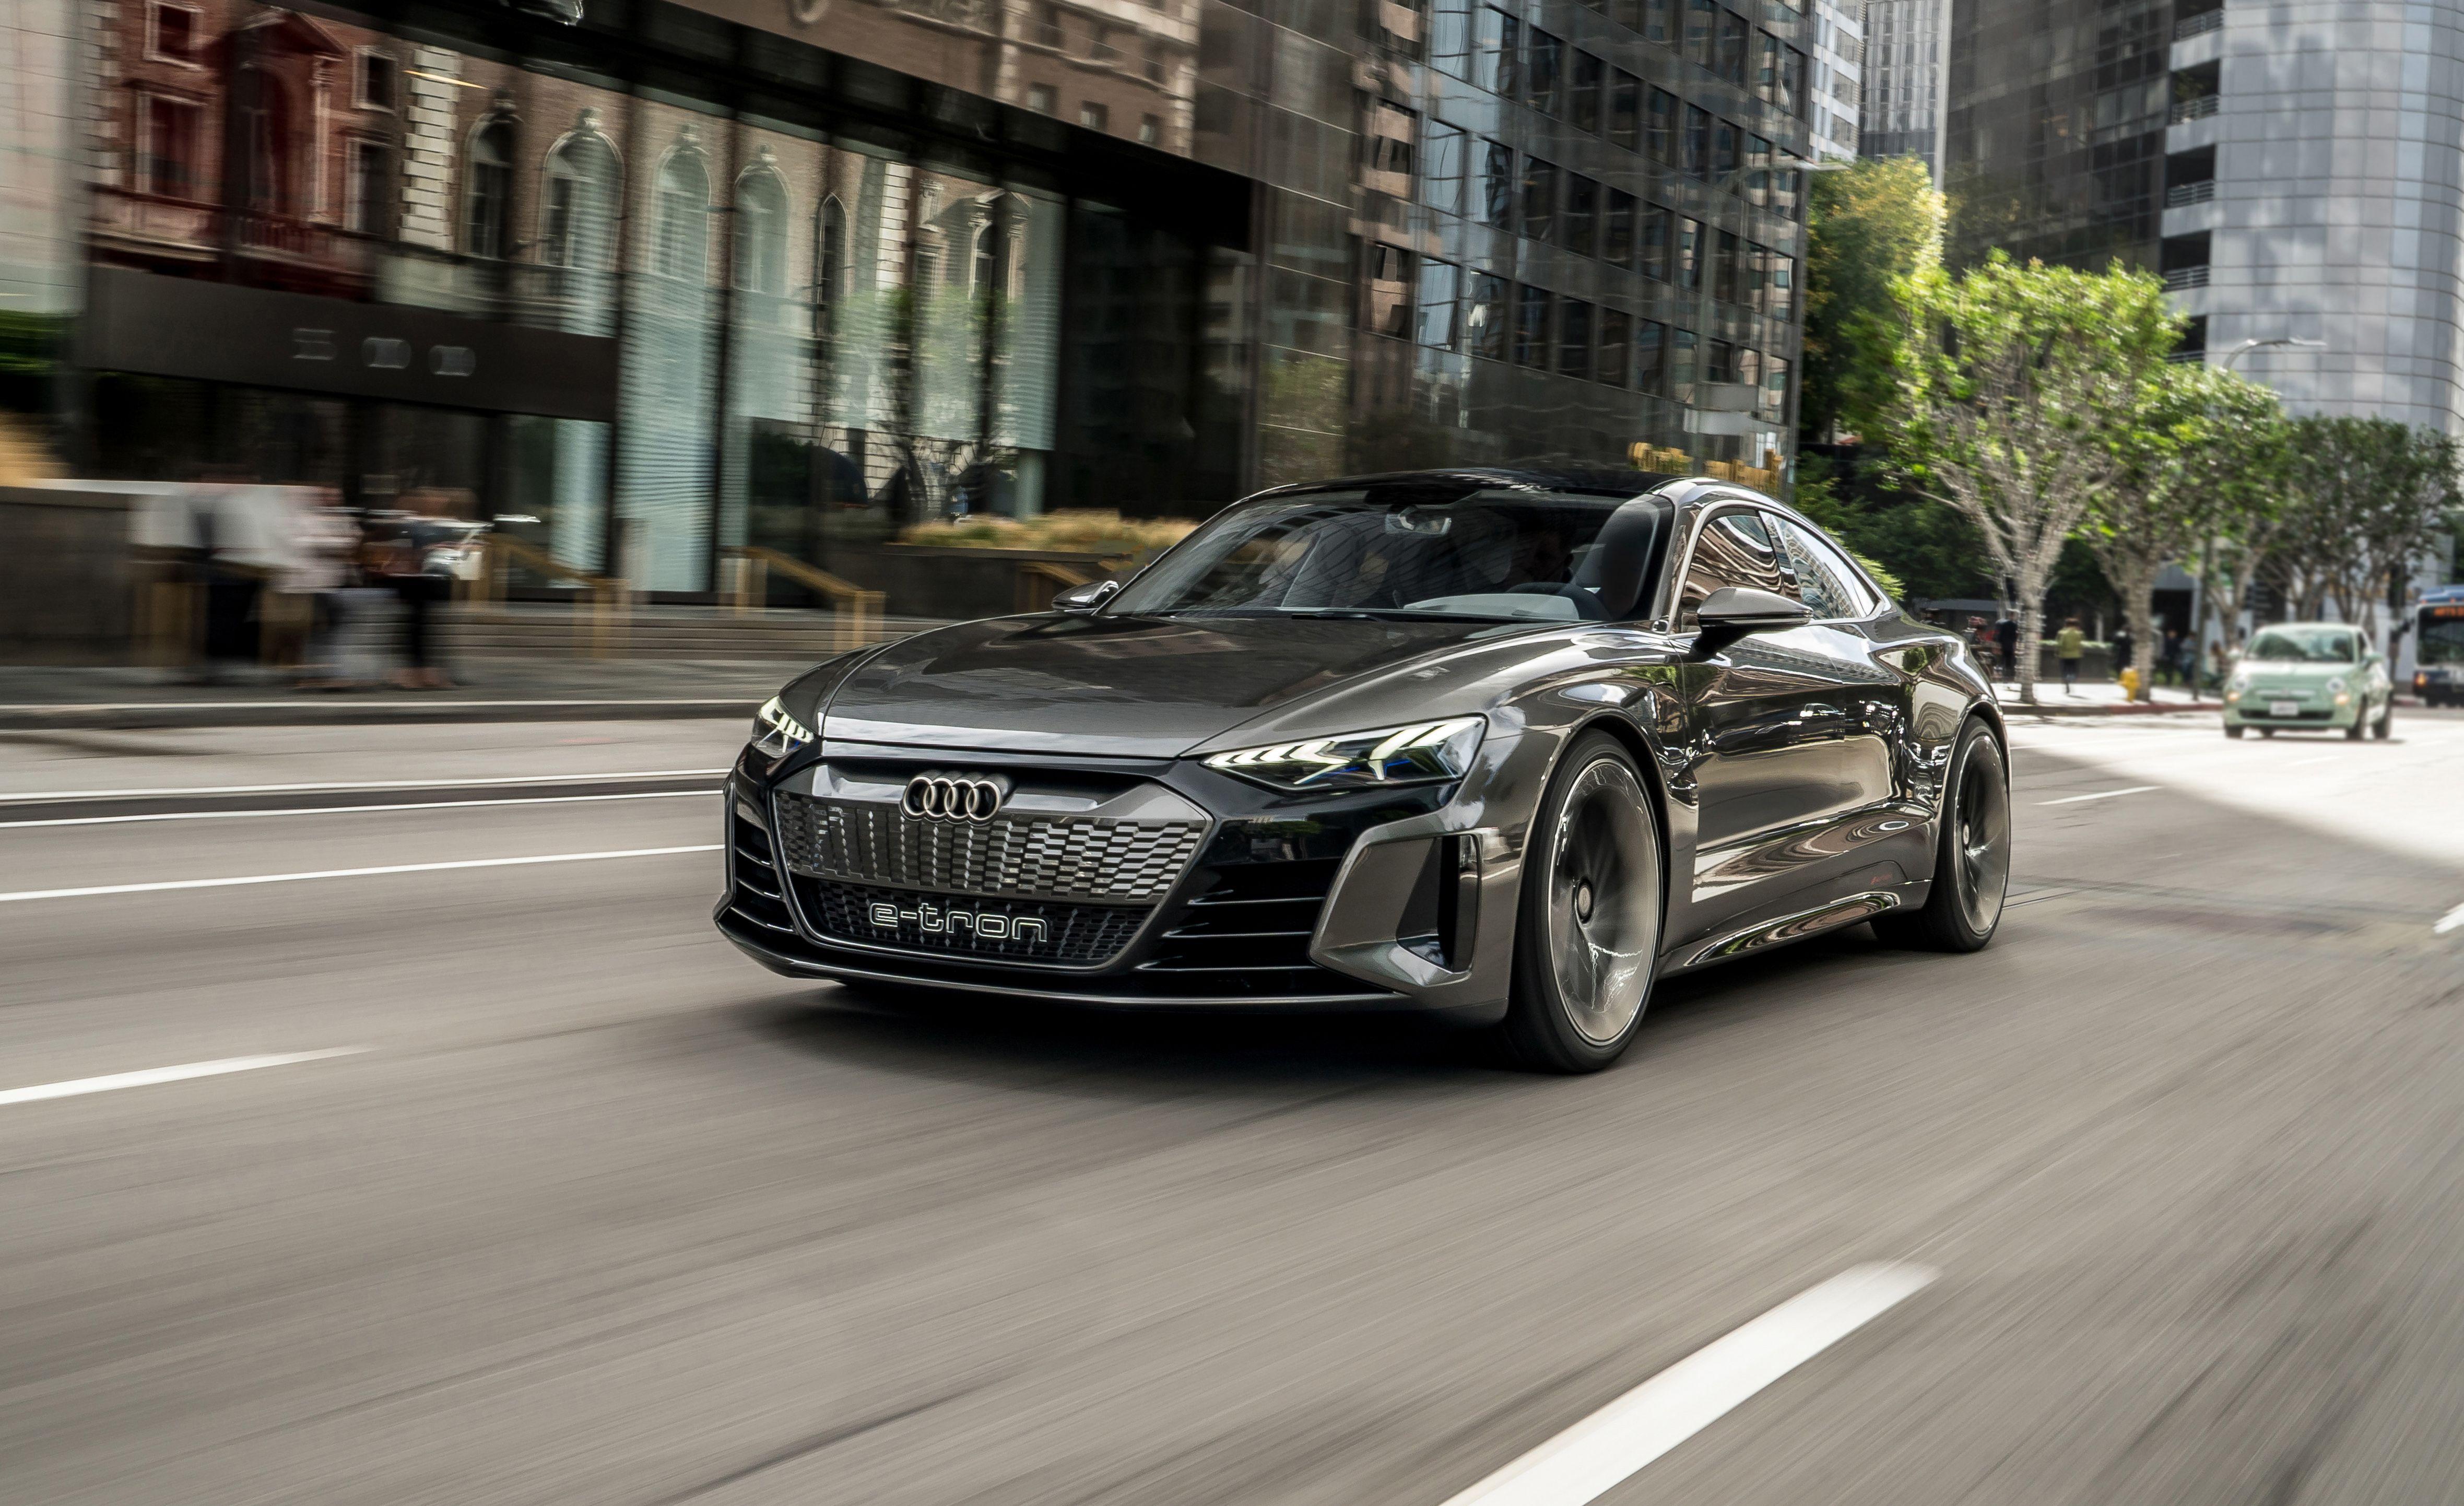 2020 Audi E Tron Gt Reviews Audi E Tron Gt Price Photos And